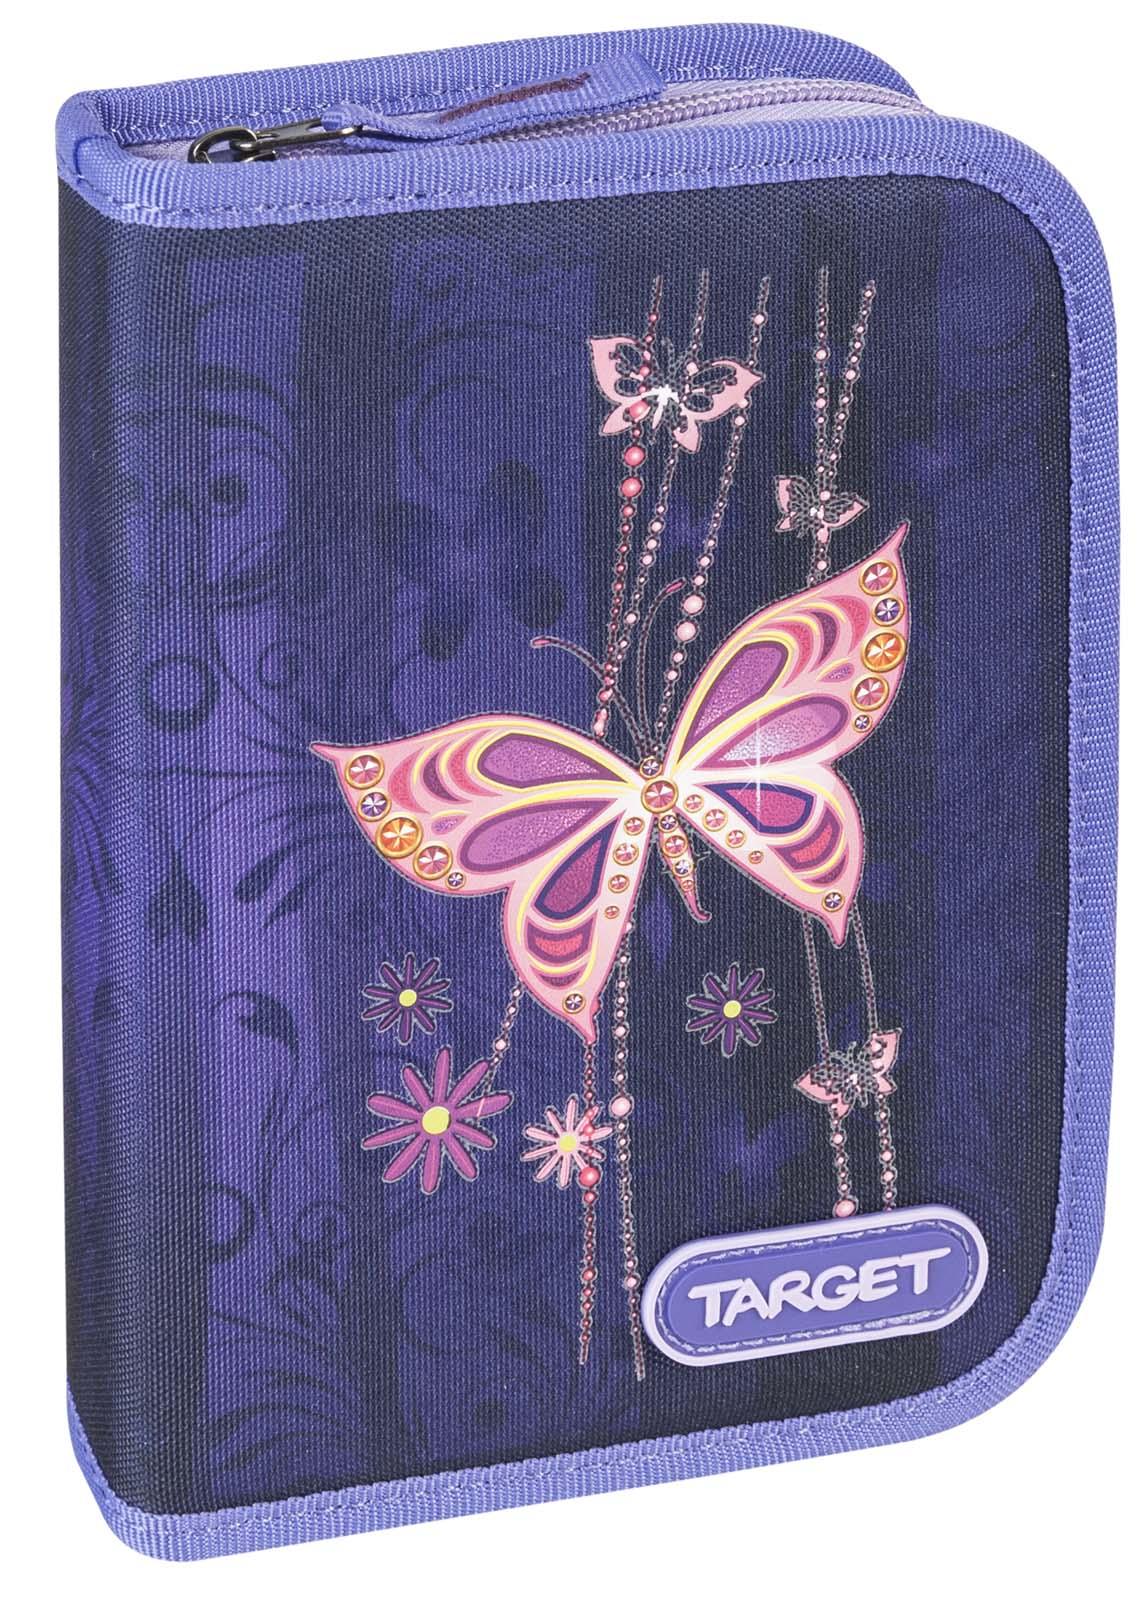 Target Collection Пенал Золотая бабочка с наполнением